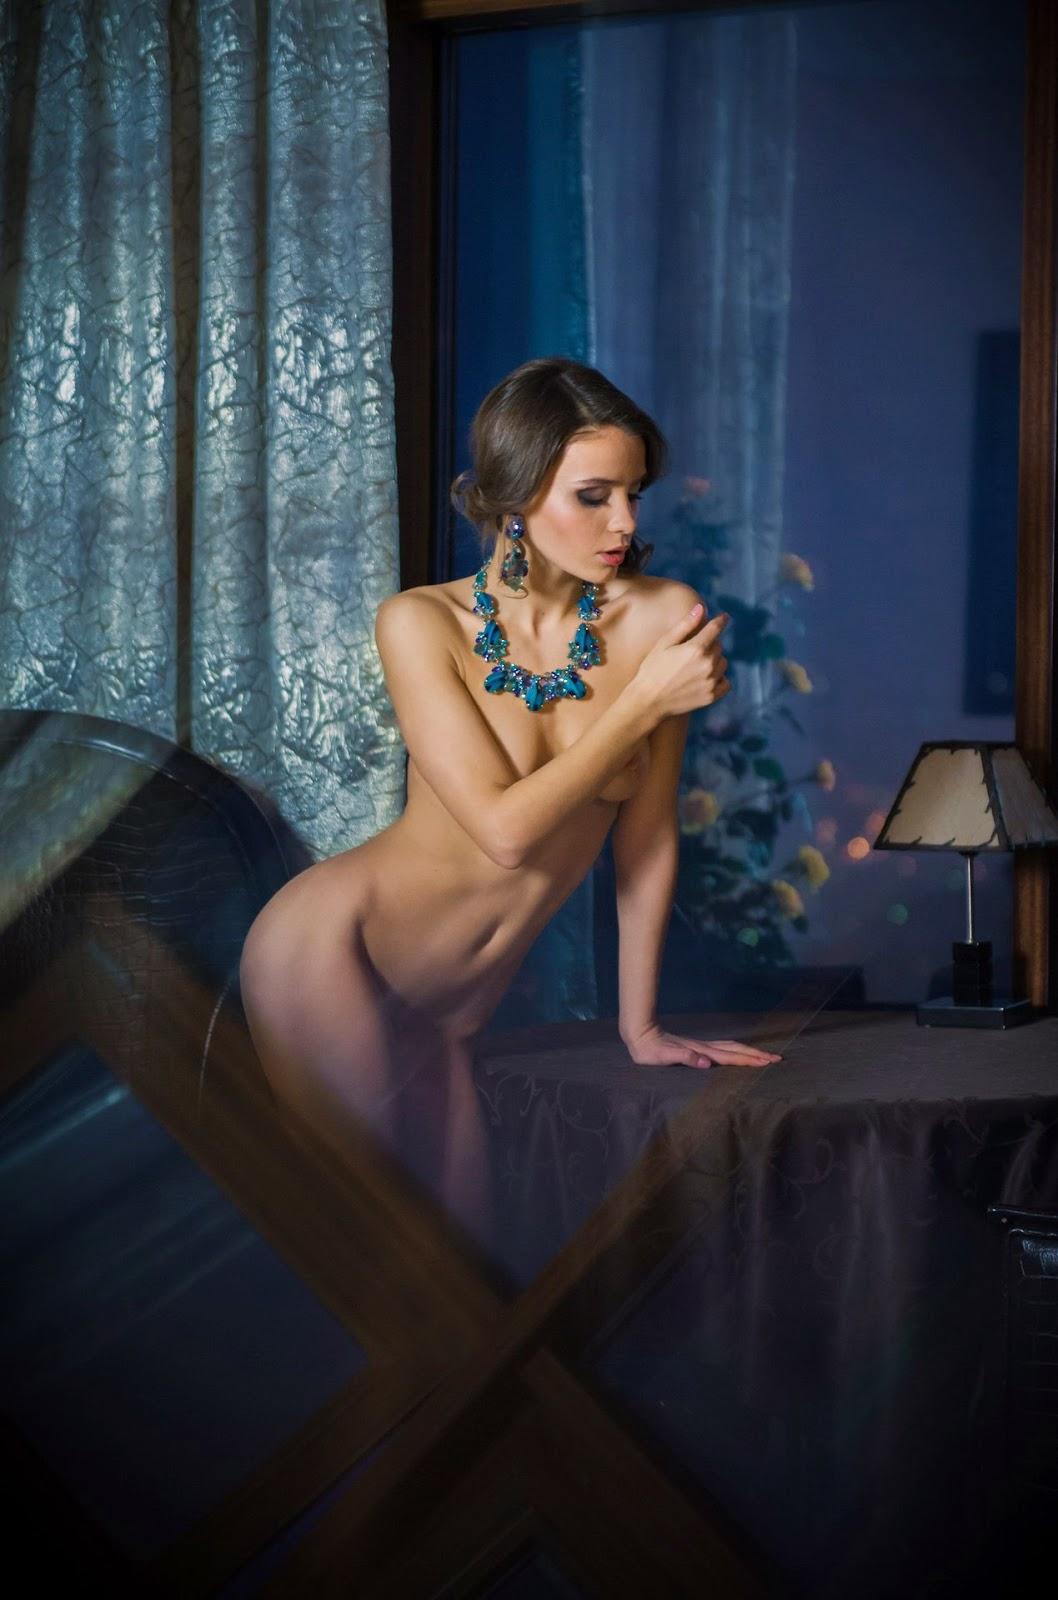 Ярко красивое порно 11 фотография